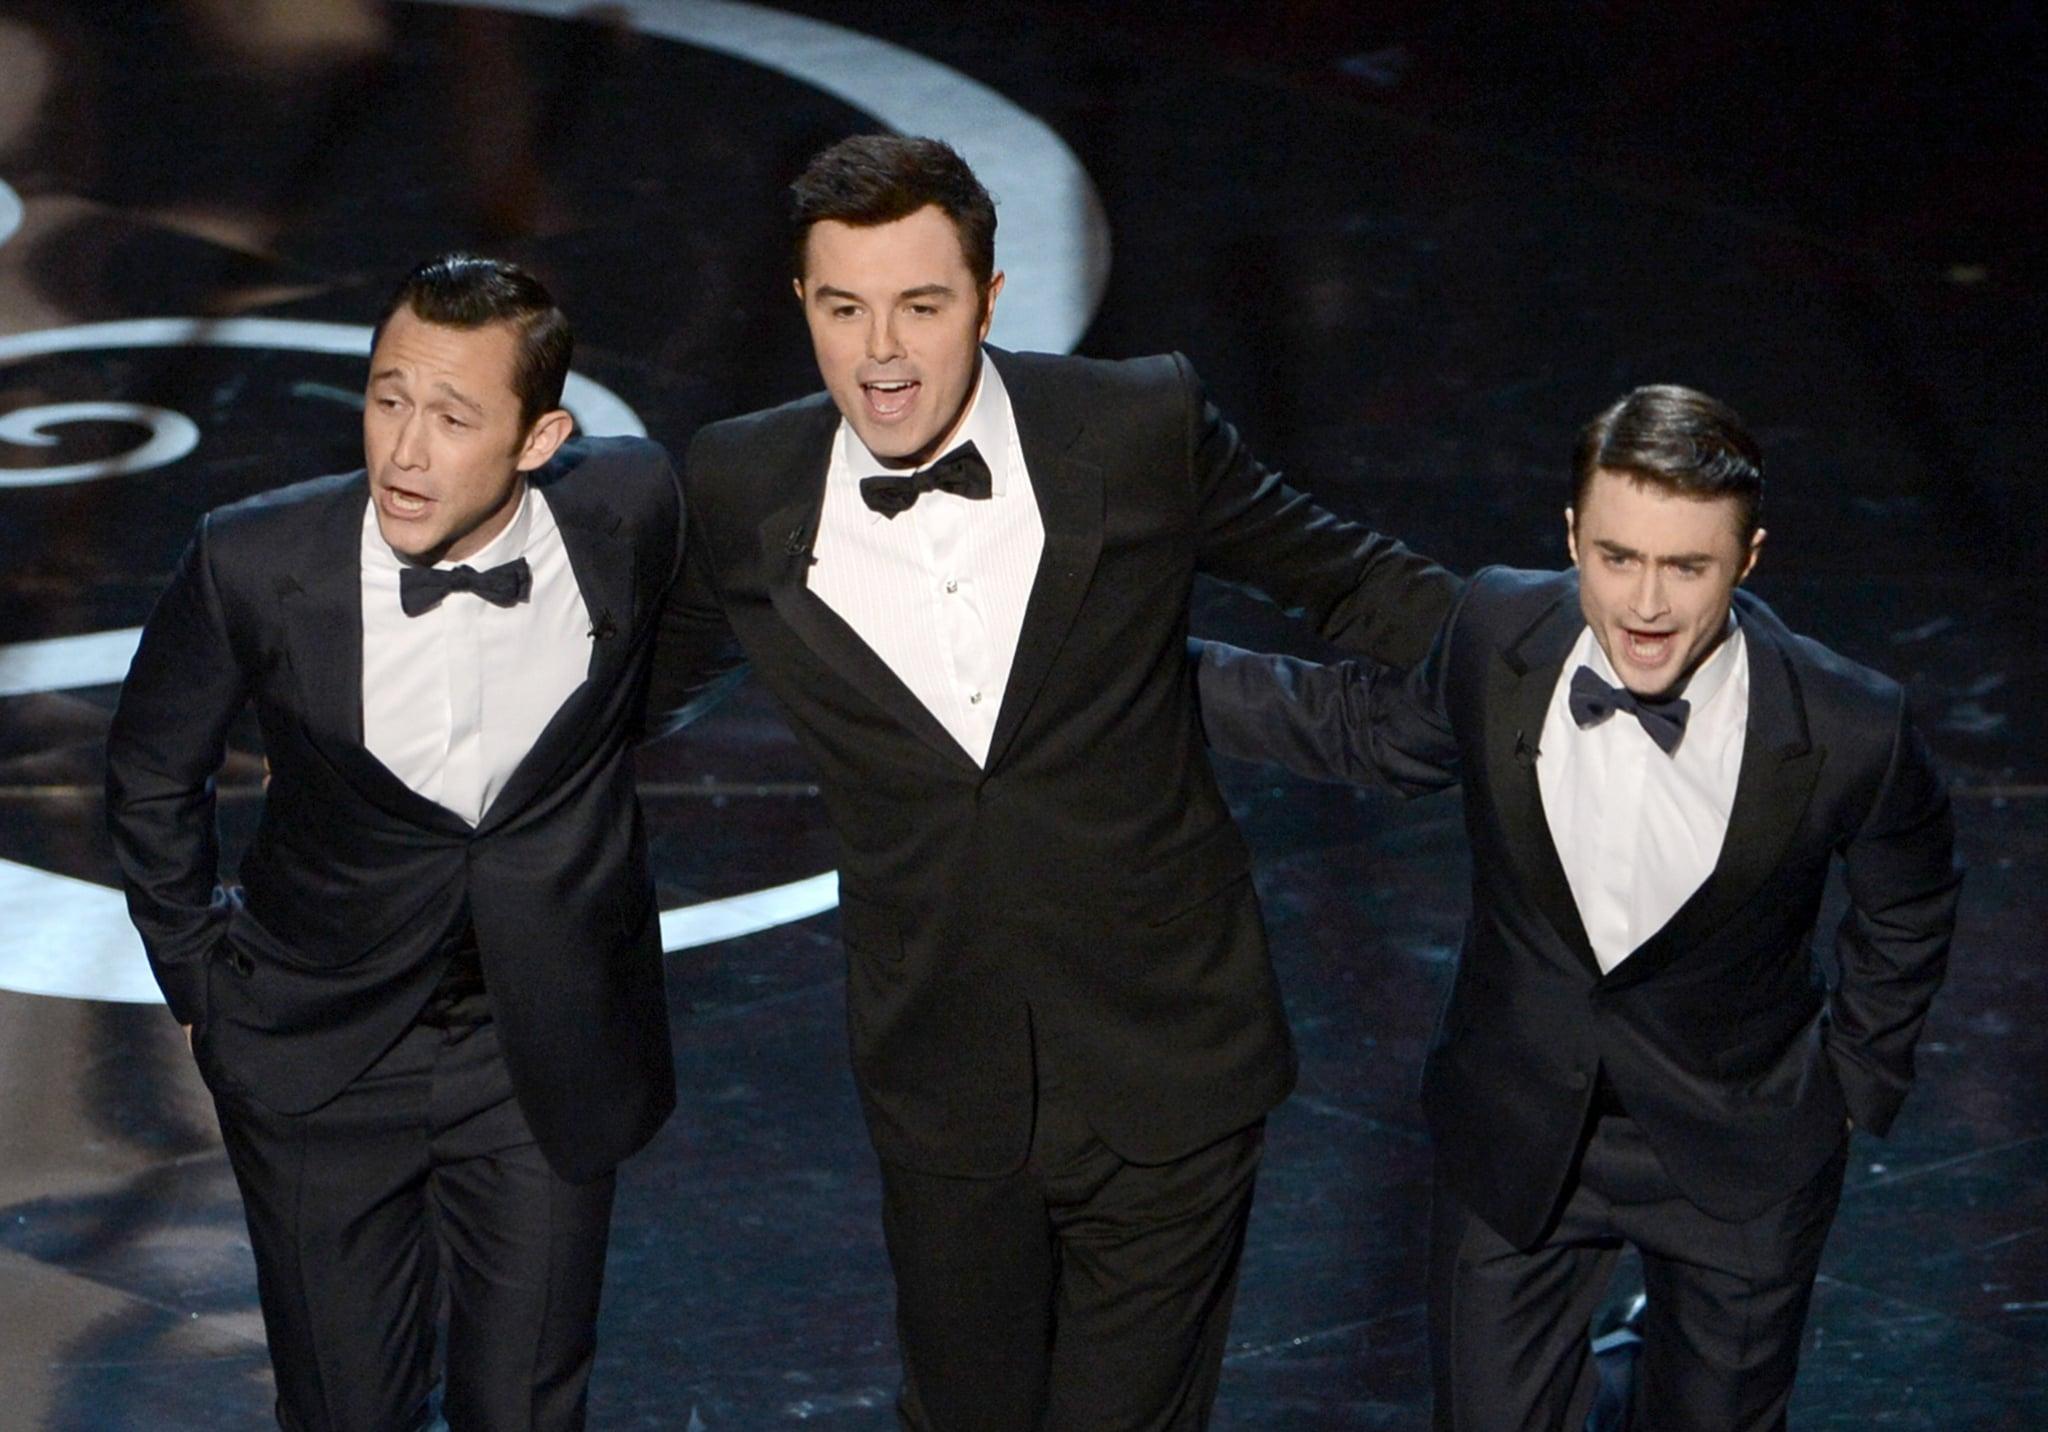 Seth MacFarlane sang with Joseph Gordon-Levitt and Daniel Radcliffe at the Oscars.